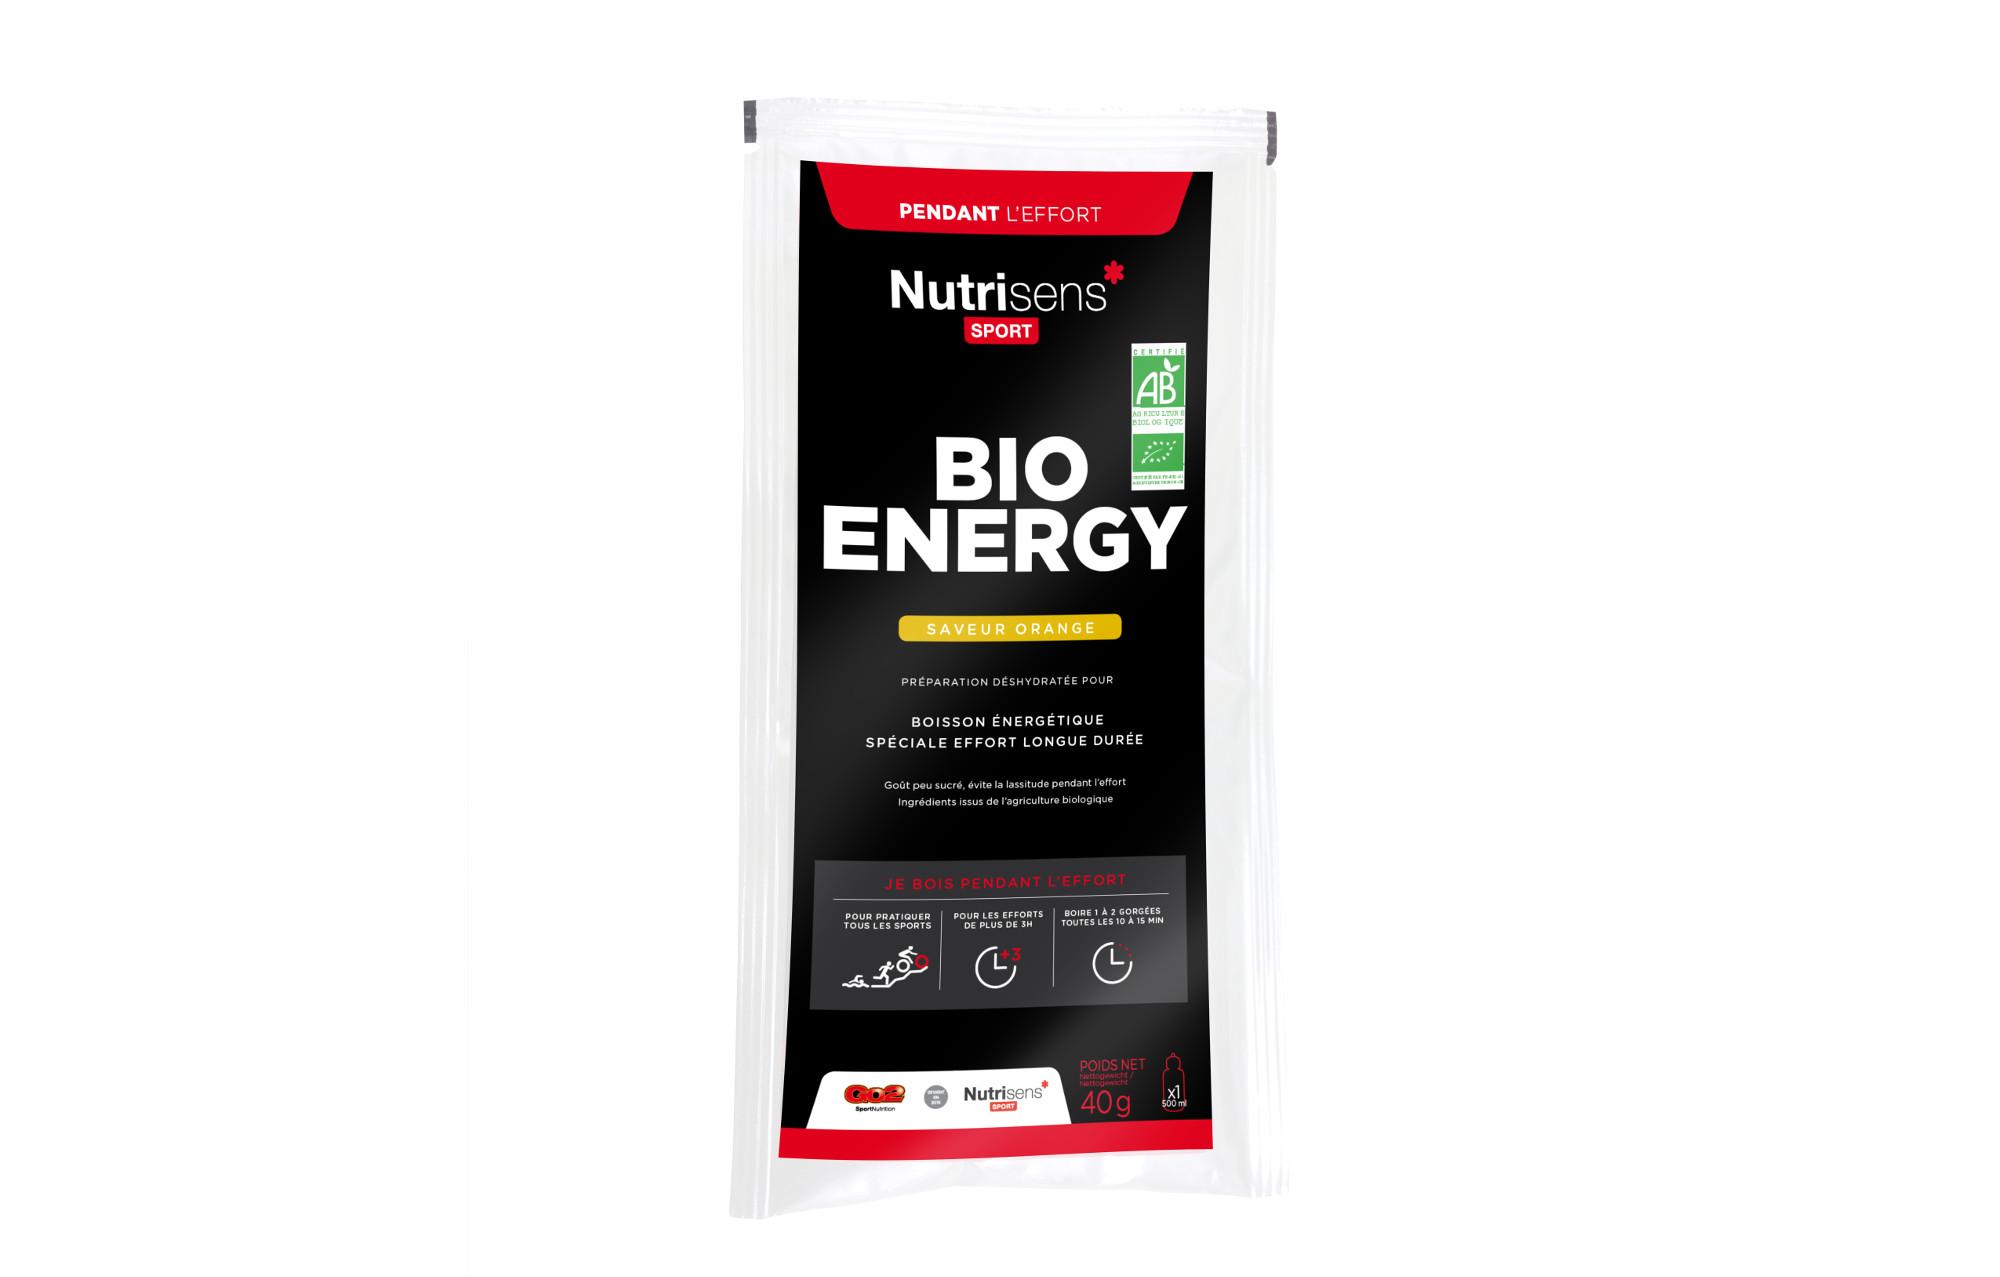 nutrisens boisson nerg tique bio energy sachet de 40g orange. Black Bedroom Furniture Sets. Home Design Ideas